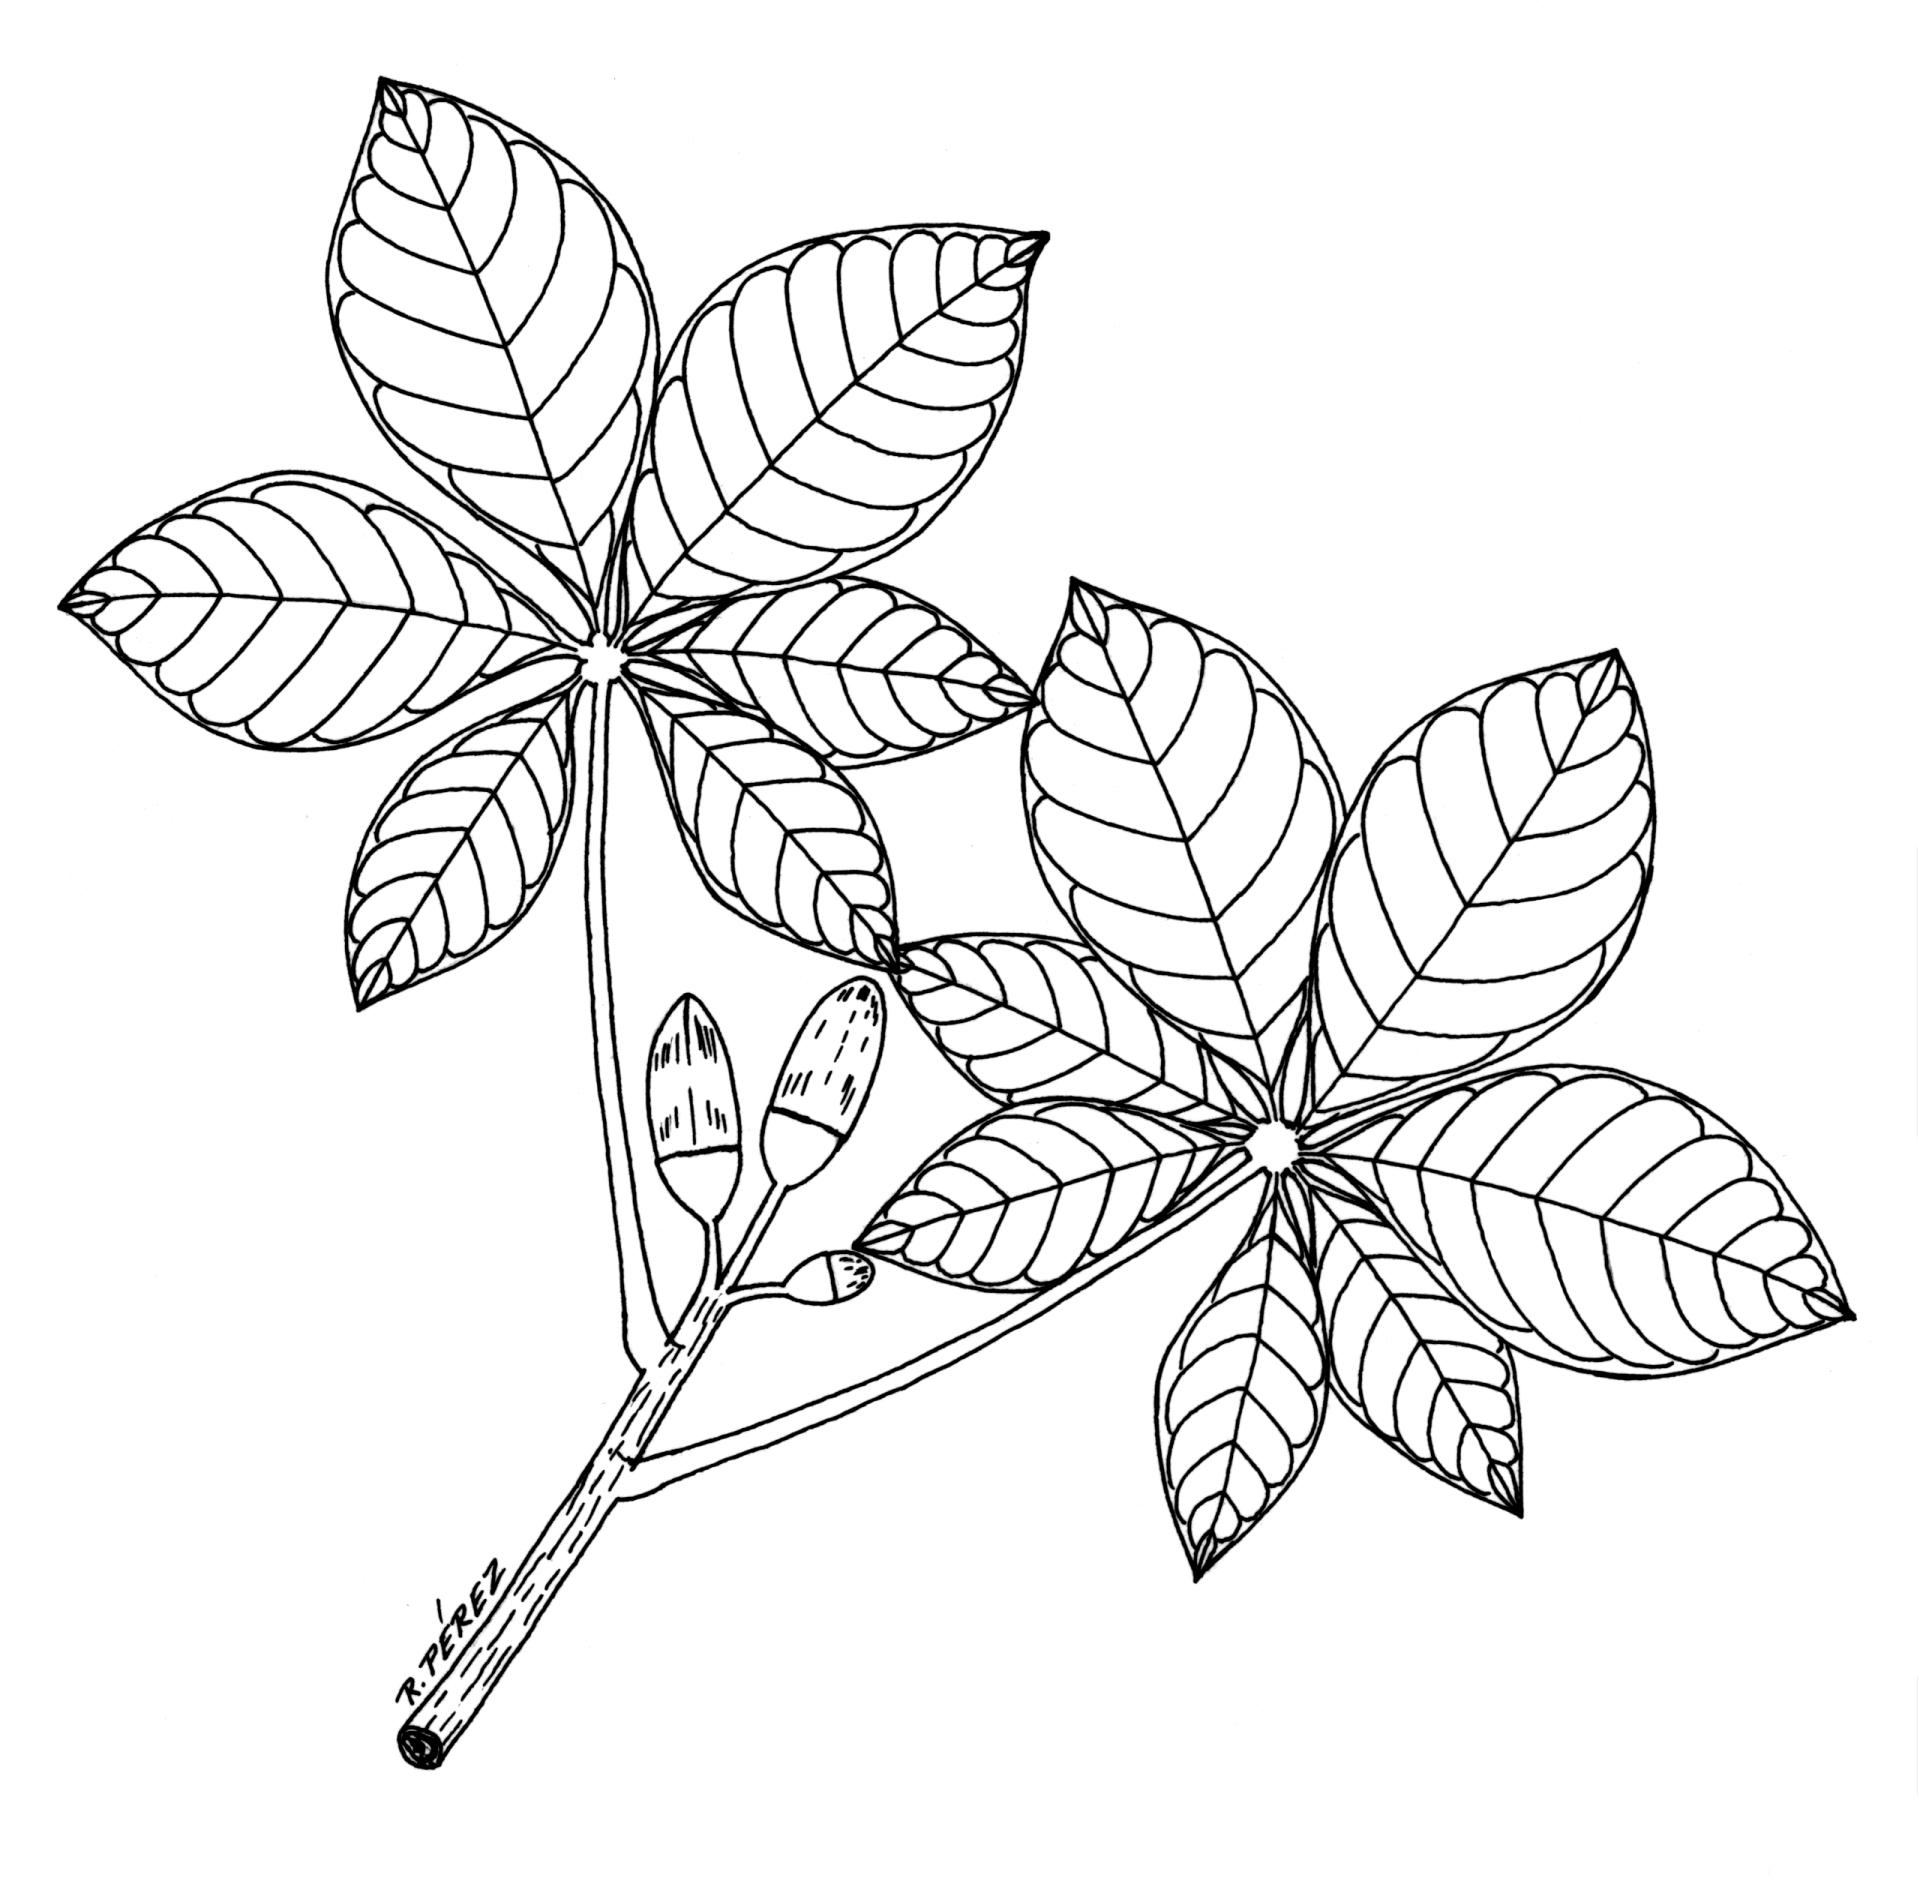 1918x1882 Flower Line Drawing E2 80 93 Pencil Art ~ Loversiq